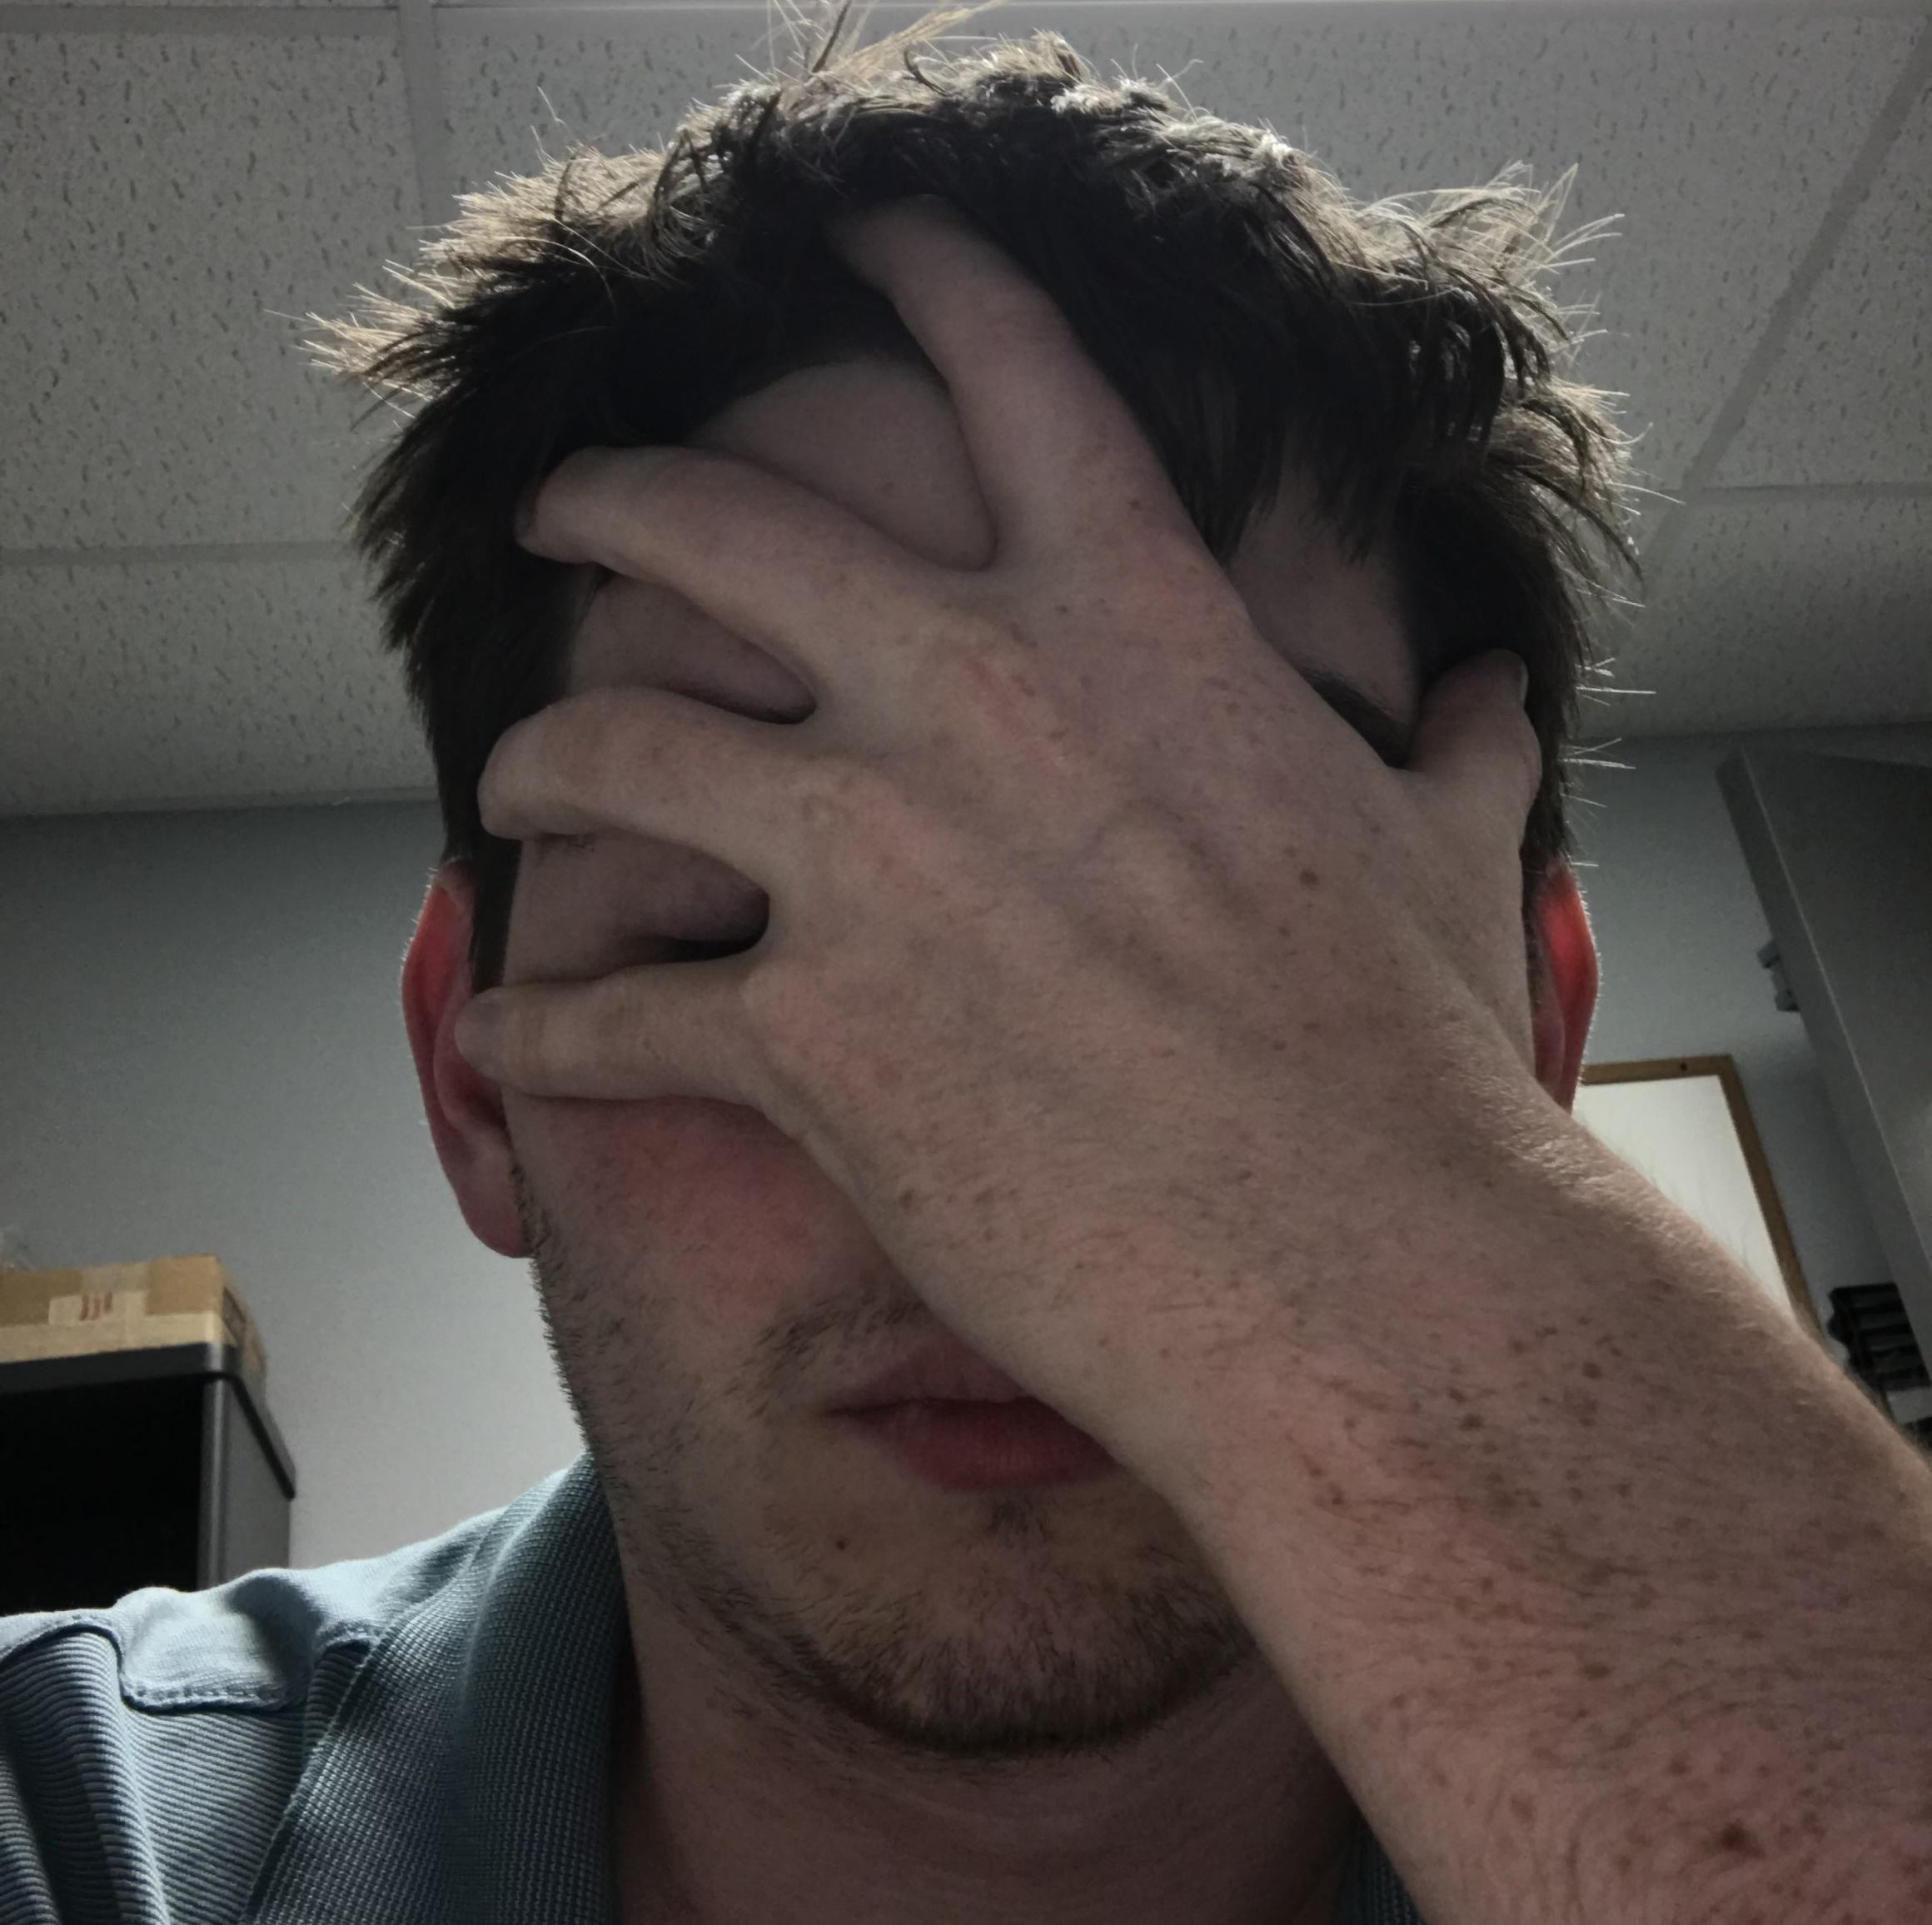 Me watching colleagues argue over part orientation... *face palm*